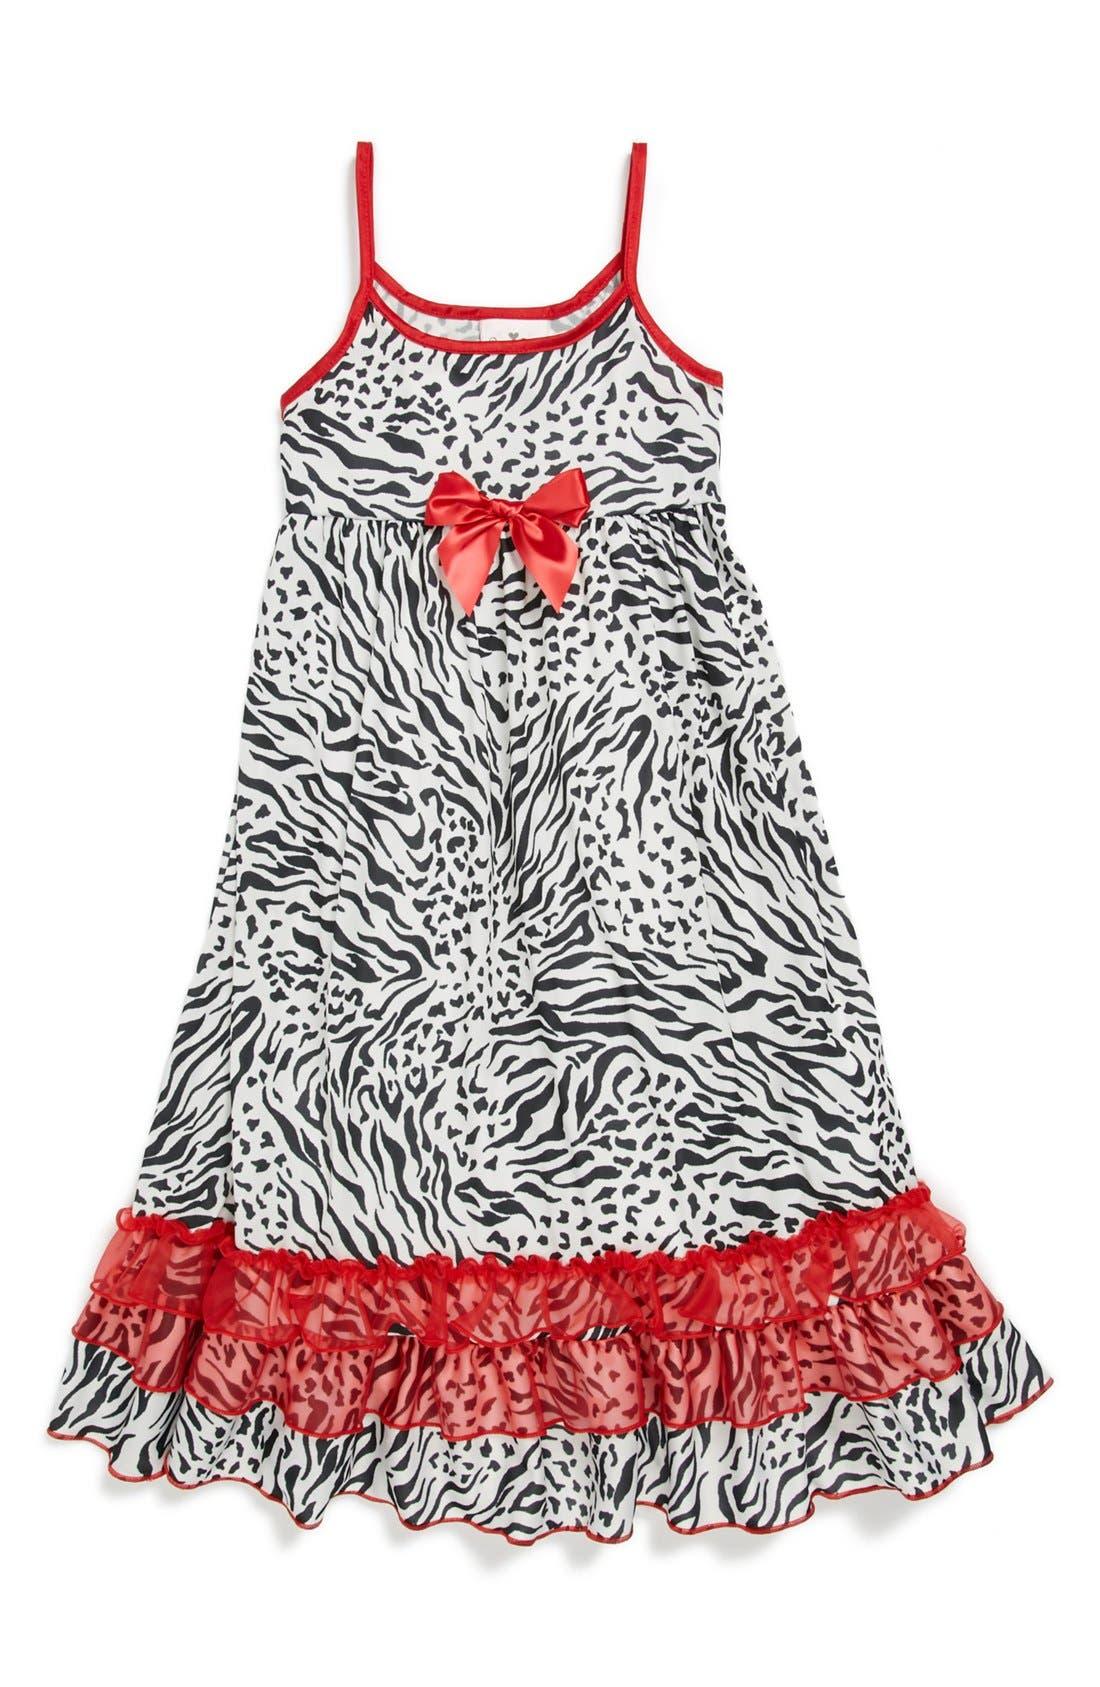 Alternate Image 1 Selected - Laura Dare Zebra Print Nightgown (Big Girls)